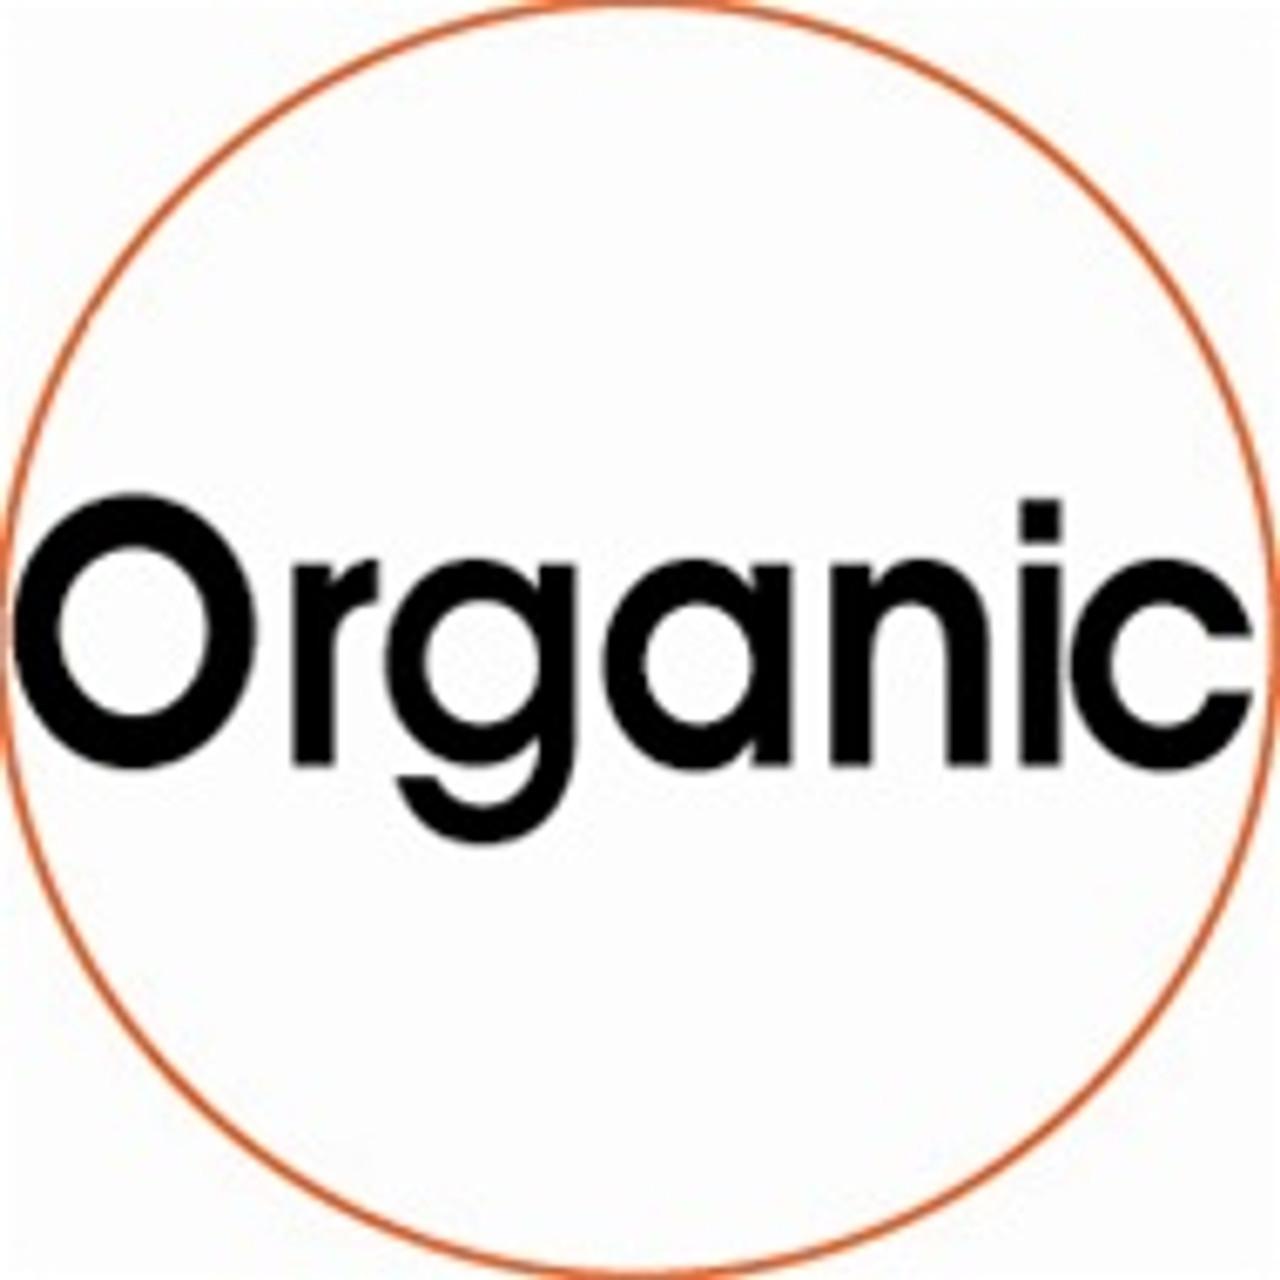 Egg Stamp - Organic Text